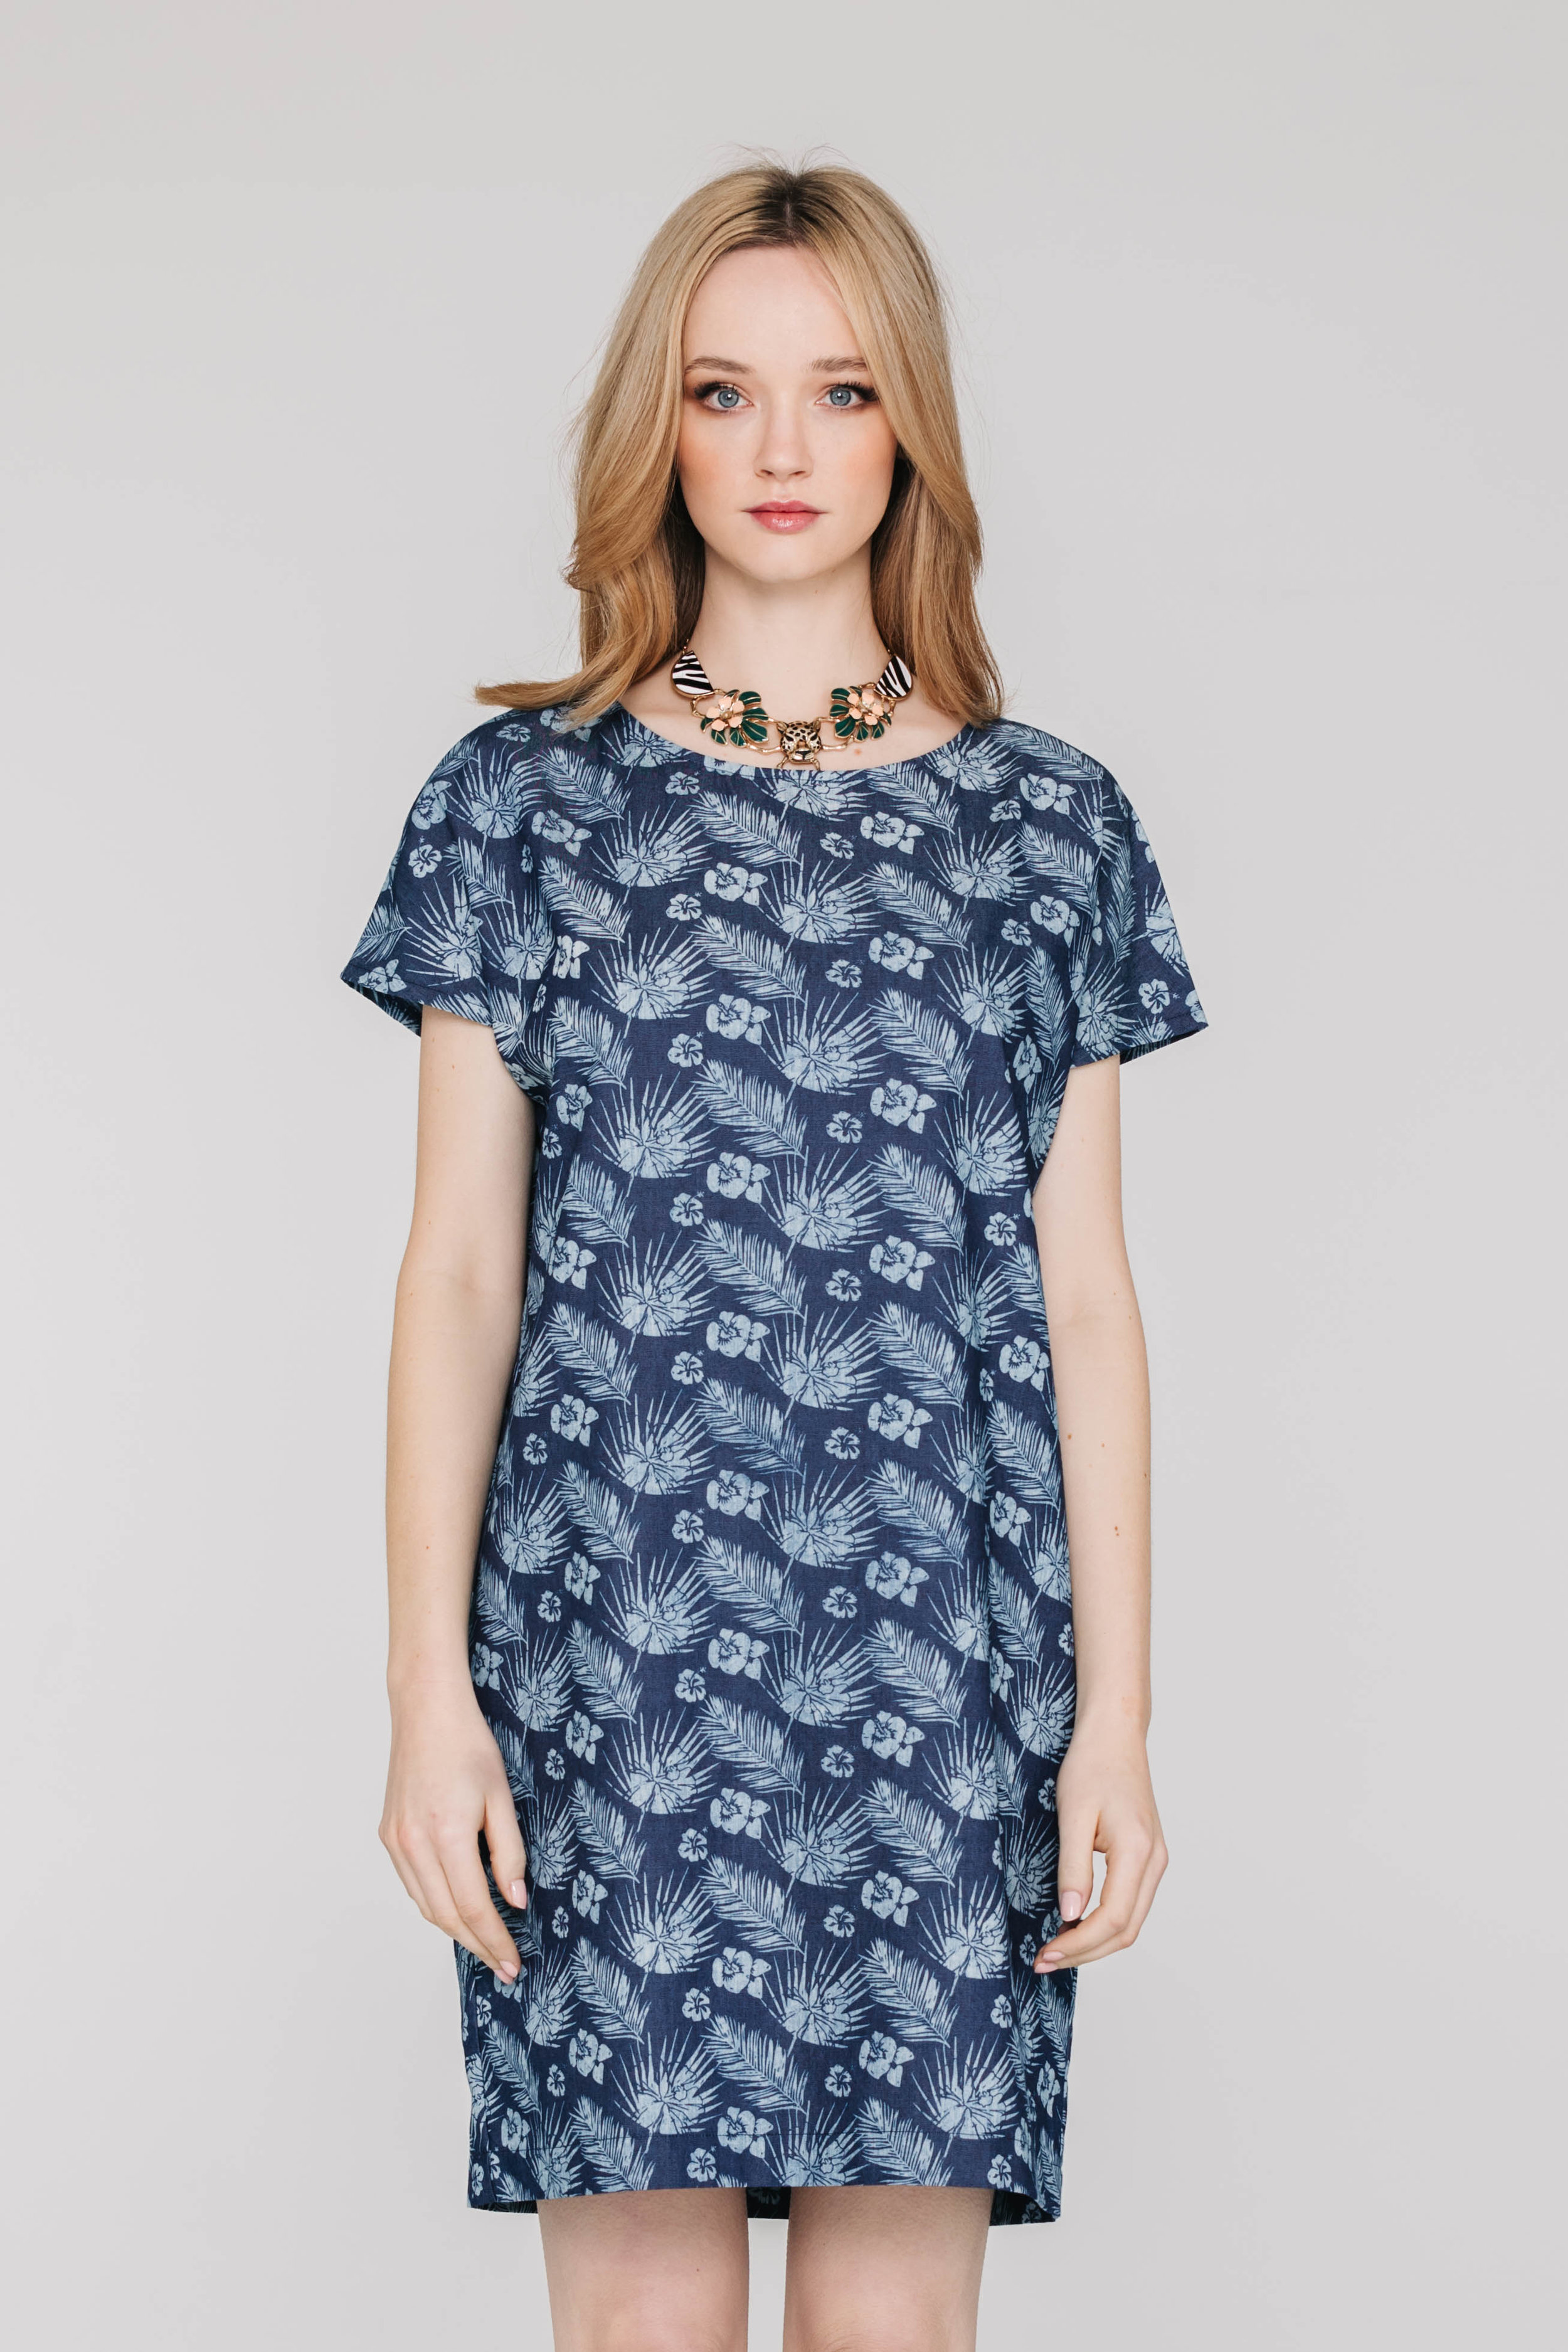 The Dress 5474N Hawaiian Denim